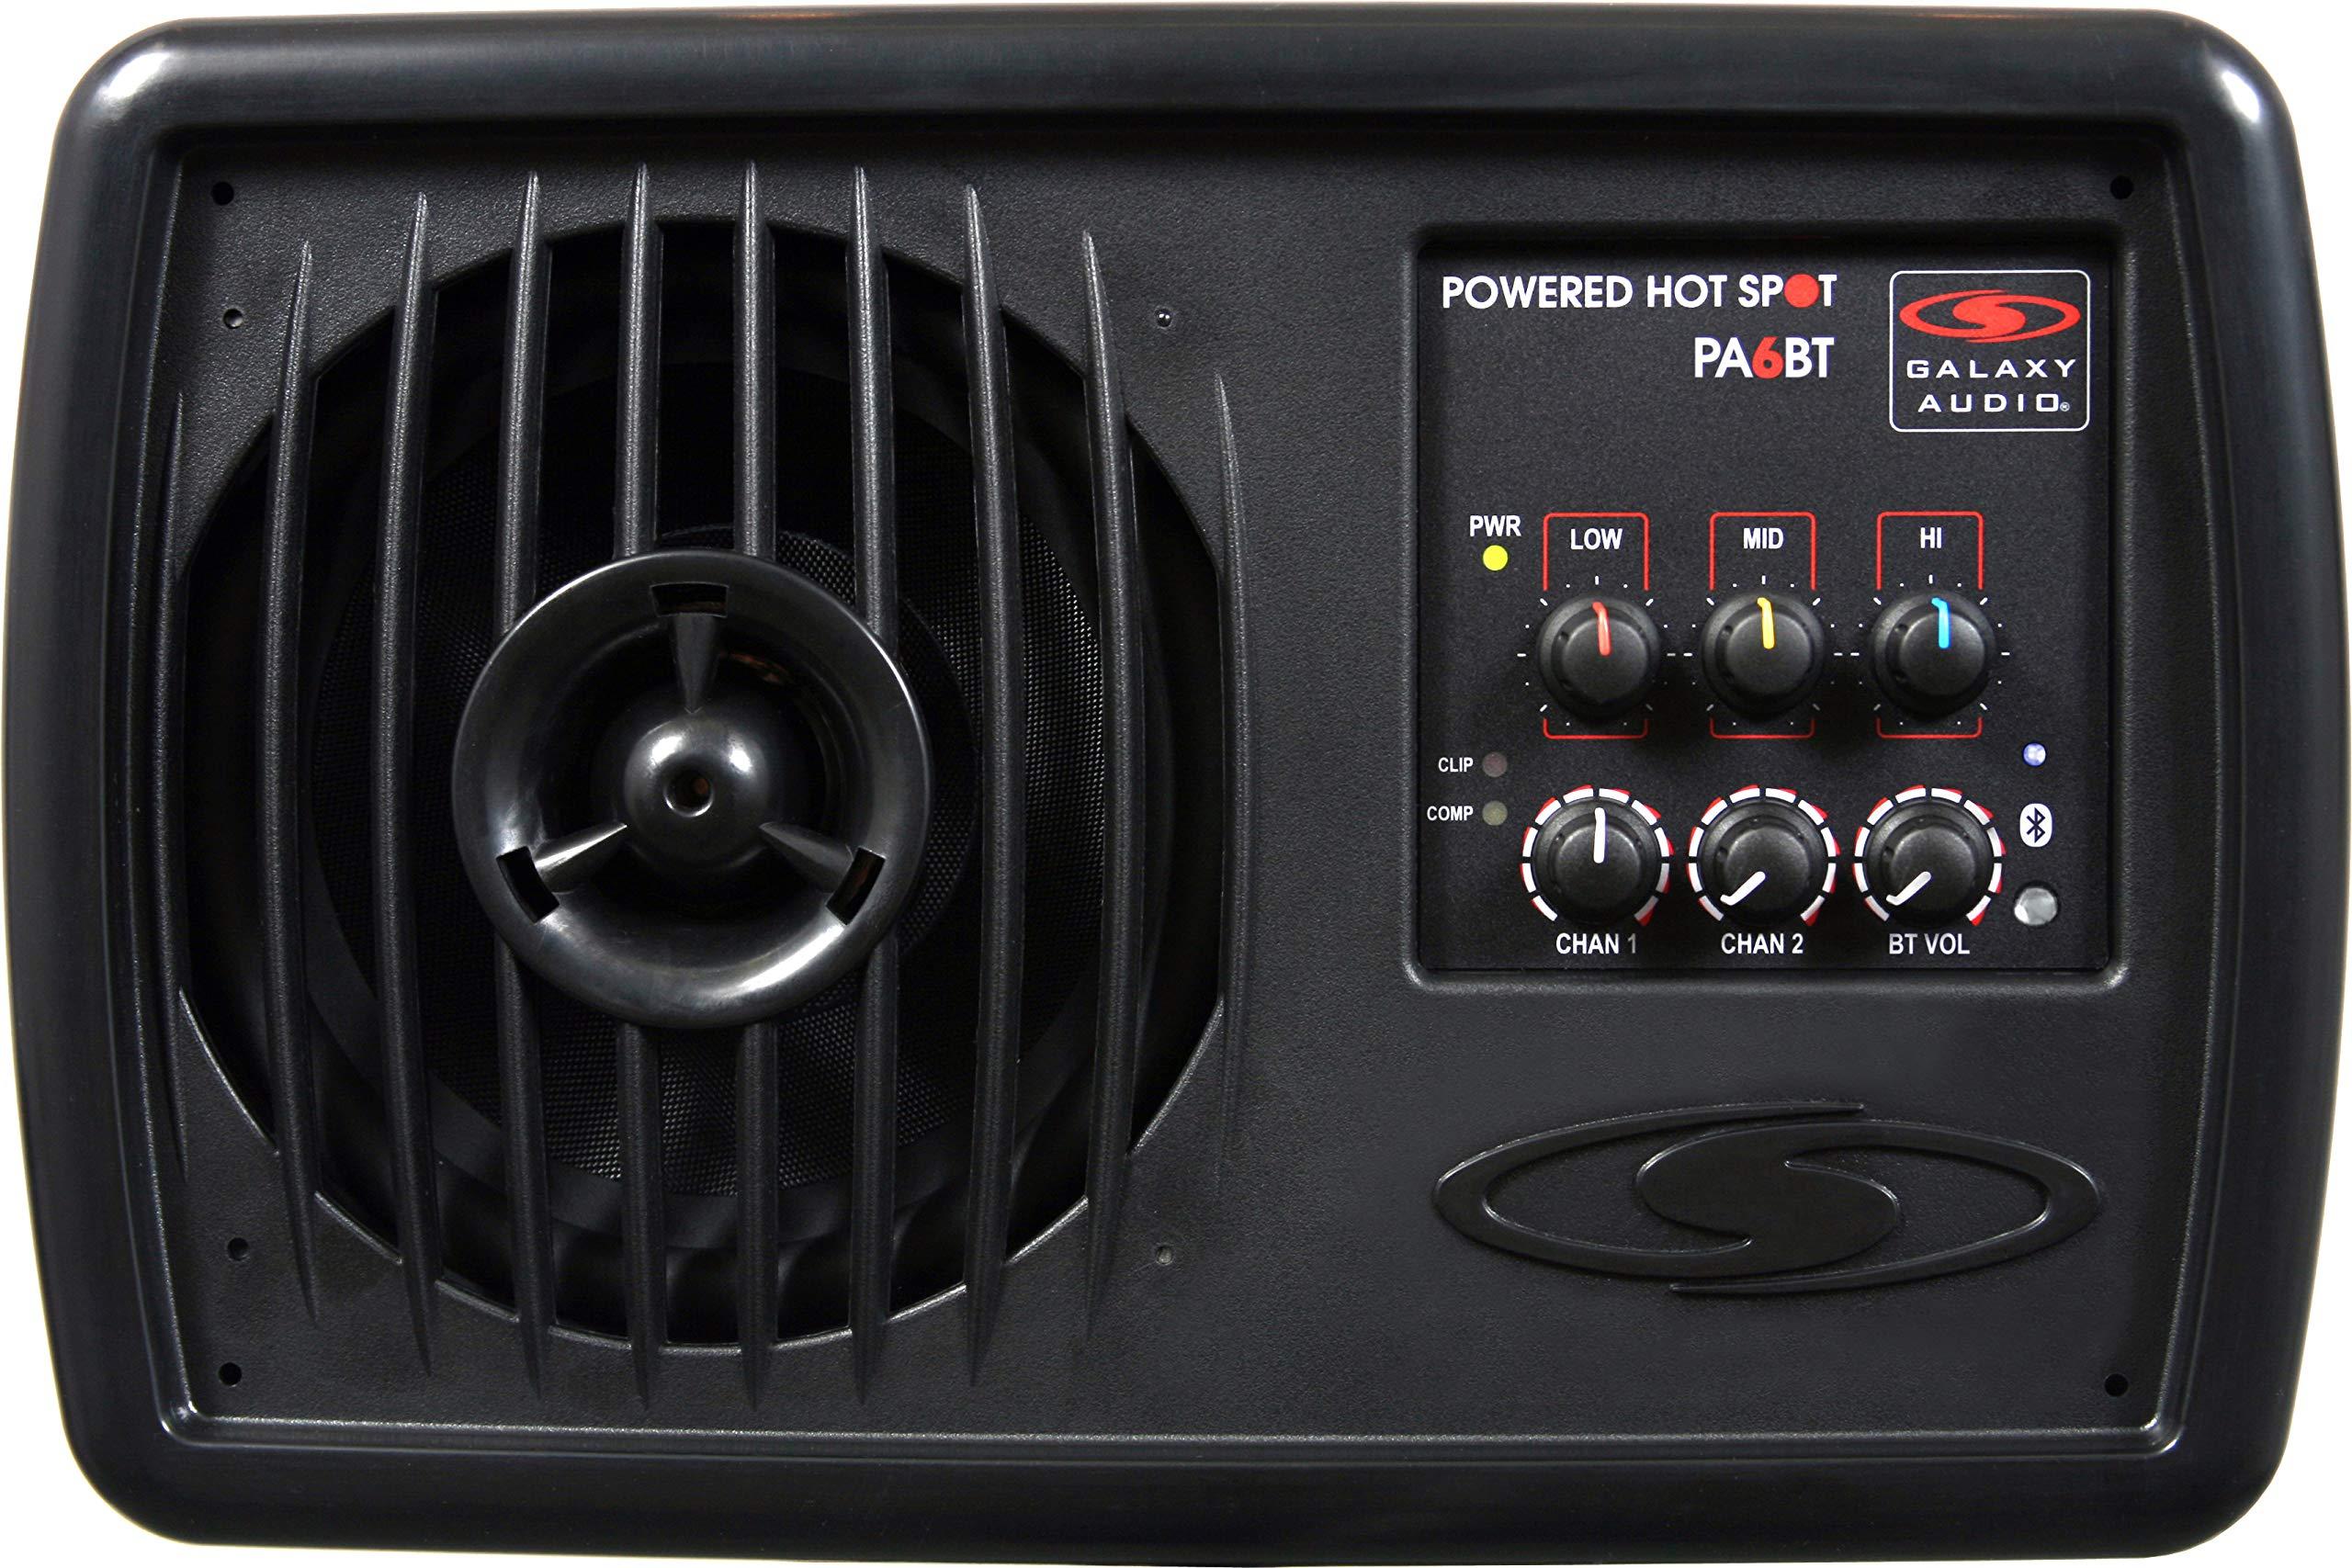 Galaxy Audio PA6BT 6'' 170 Watt 2-Way Powered Hot Spot Monitor Speaker With Bluetooth by Galaxy Audio